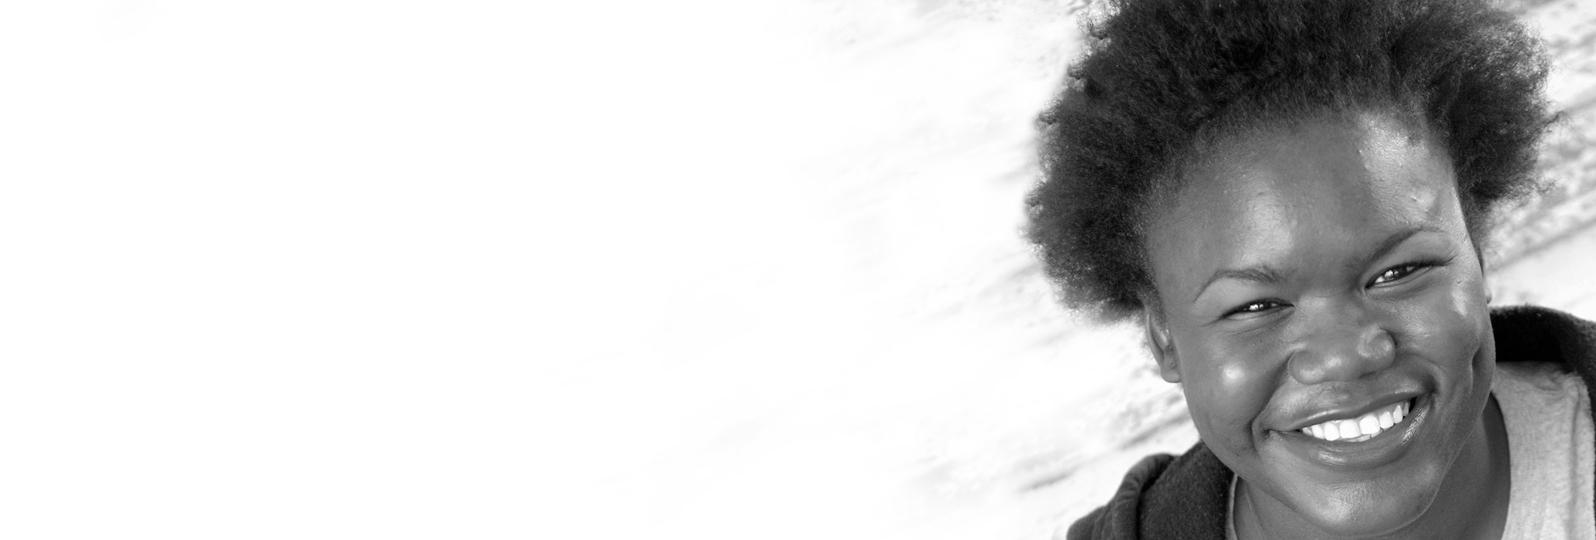 magalhaes-profile-19.jpg